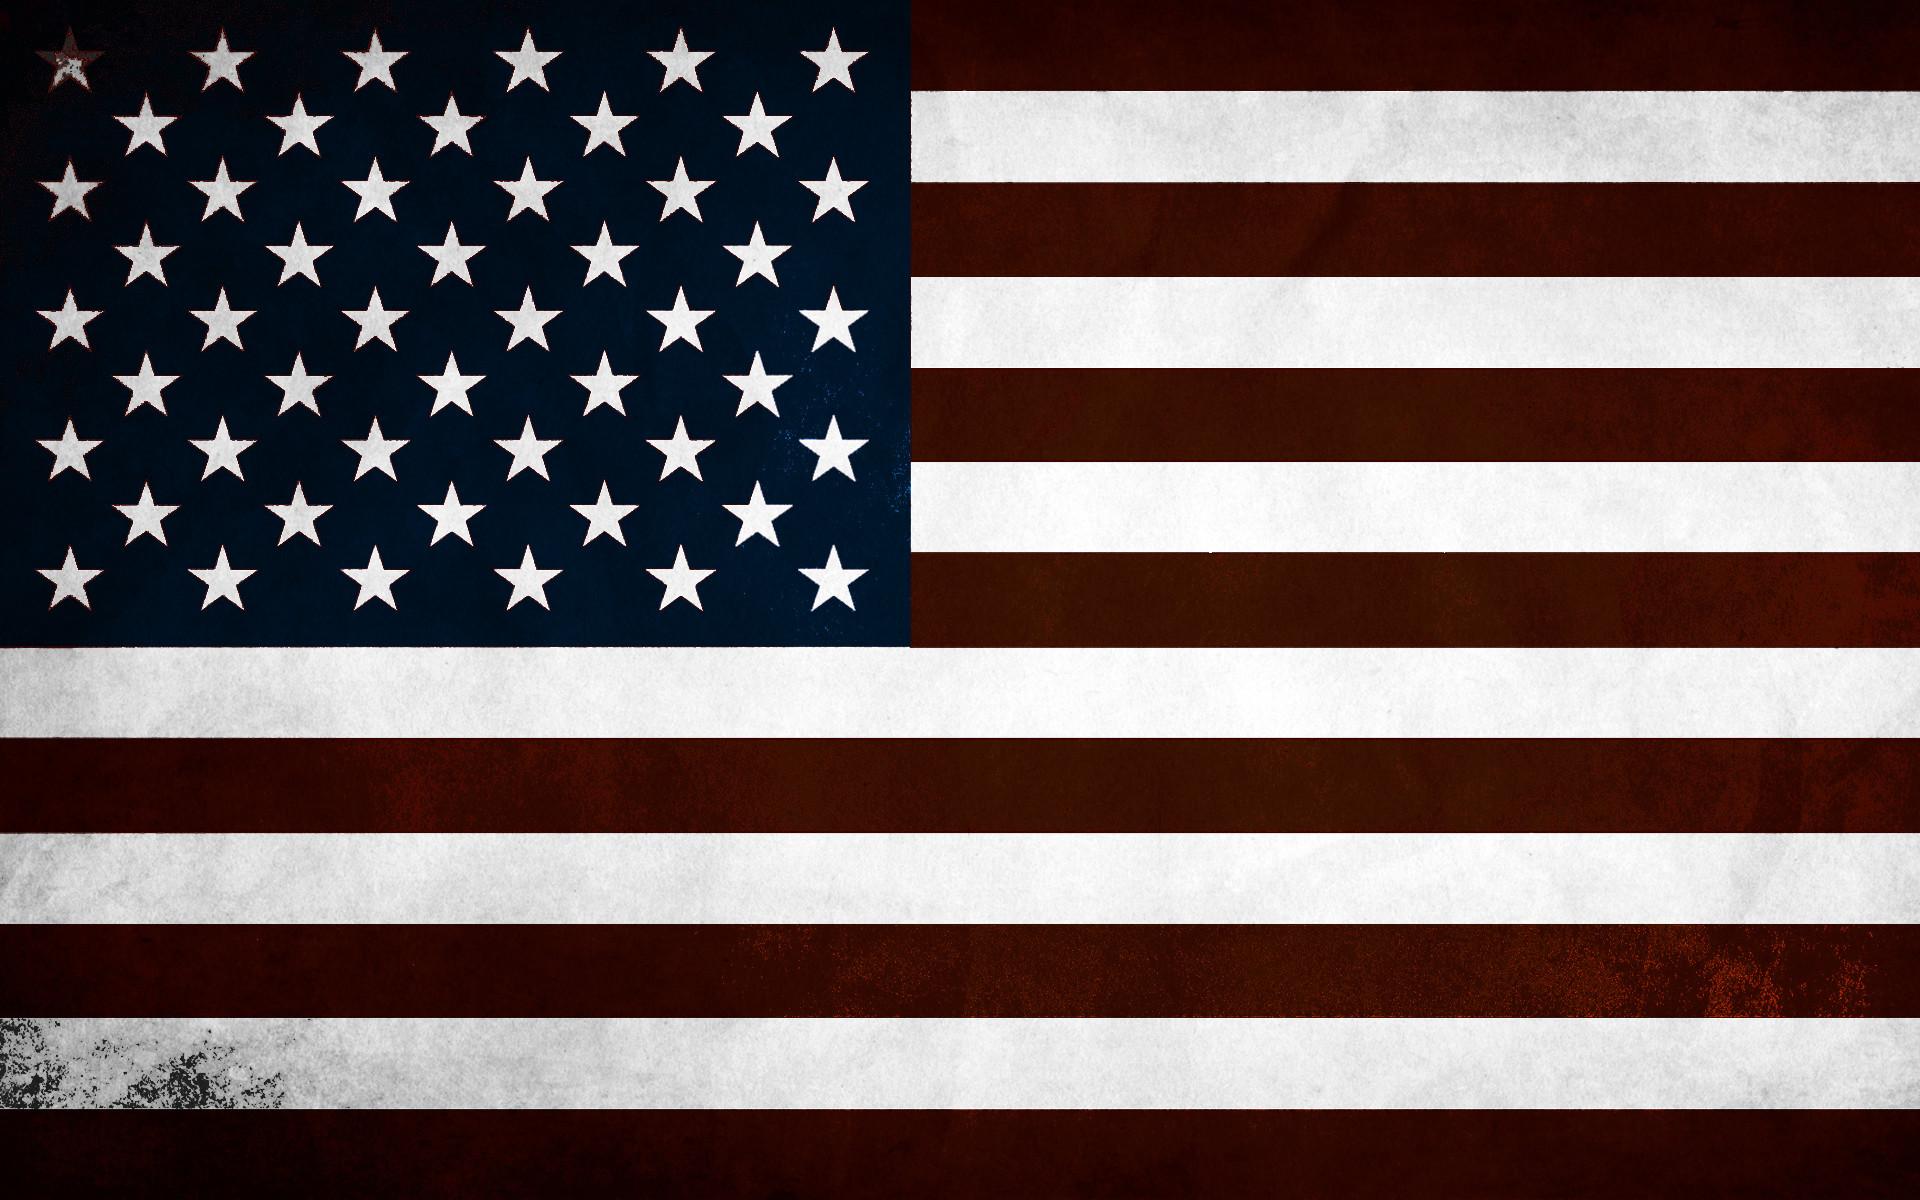 American Flag HD desktop wallpaper High Definition Fullscreen